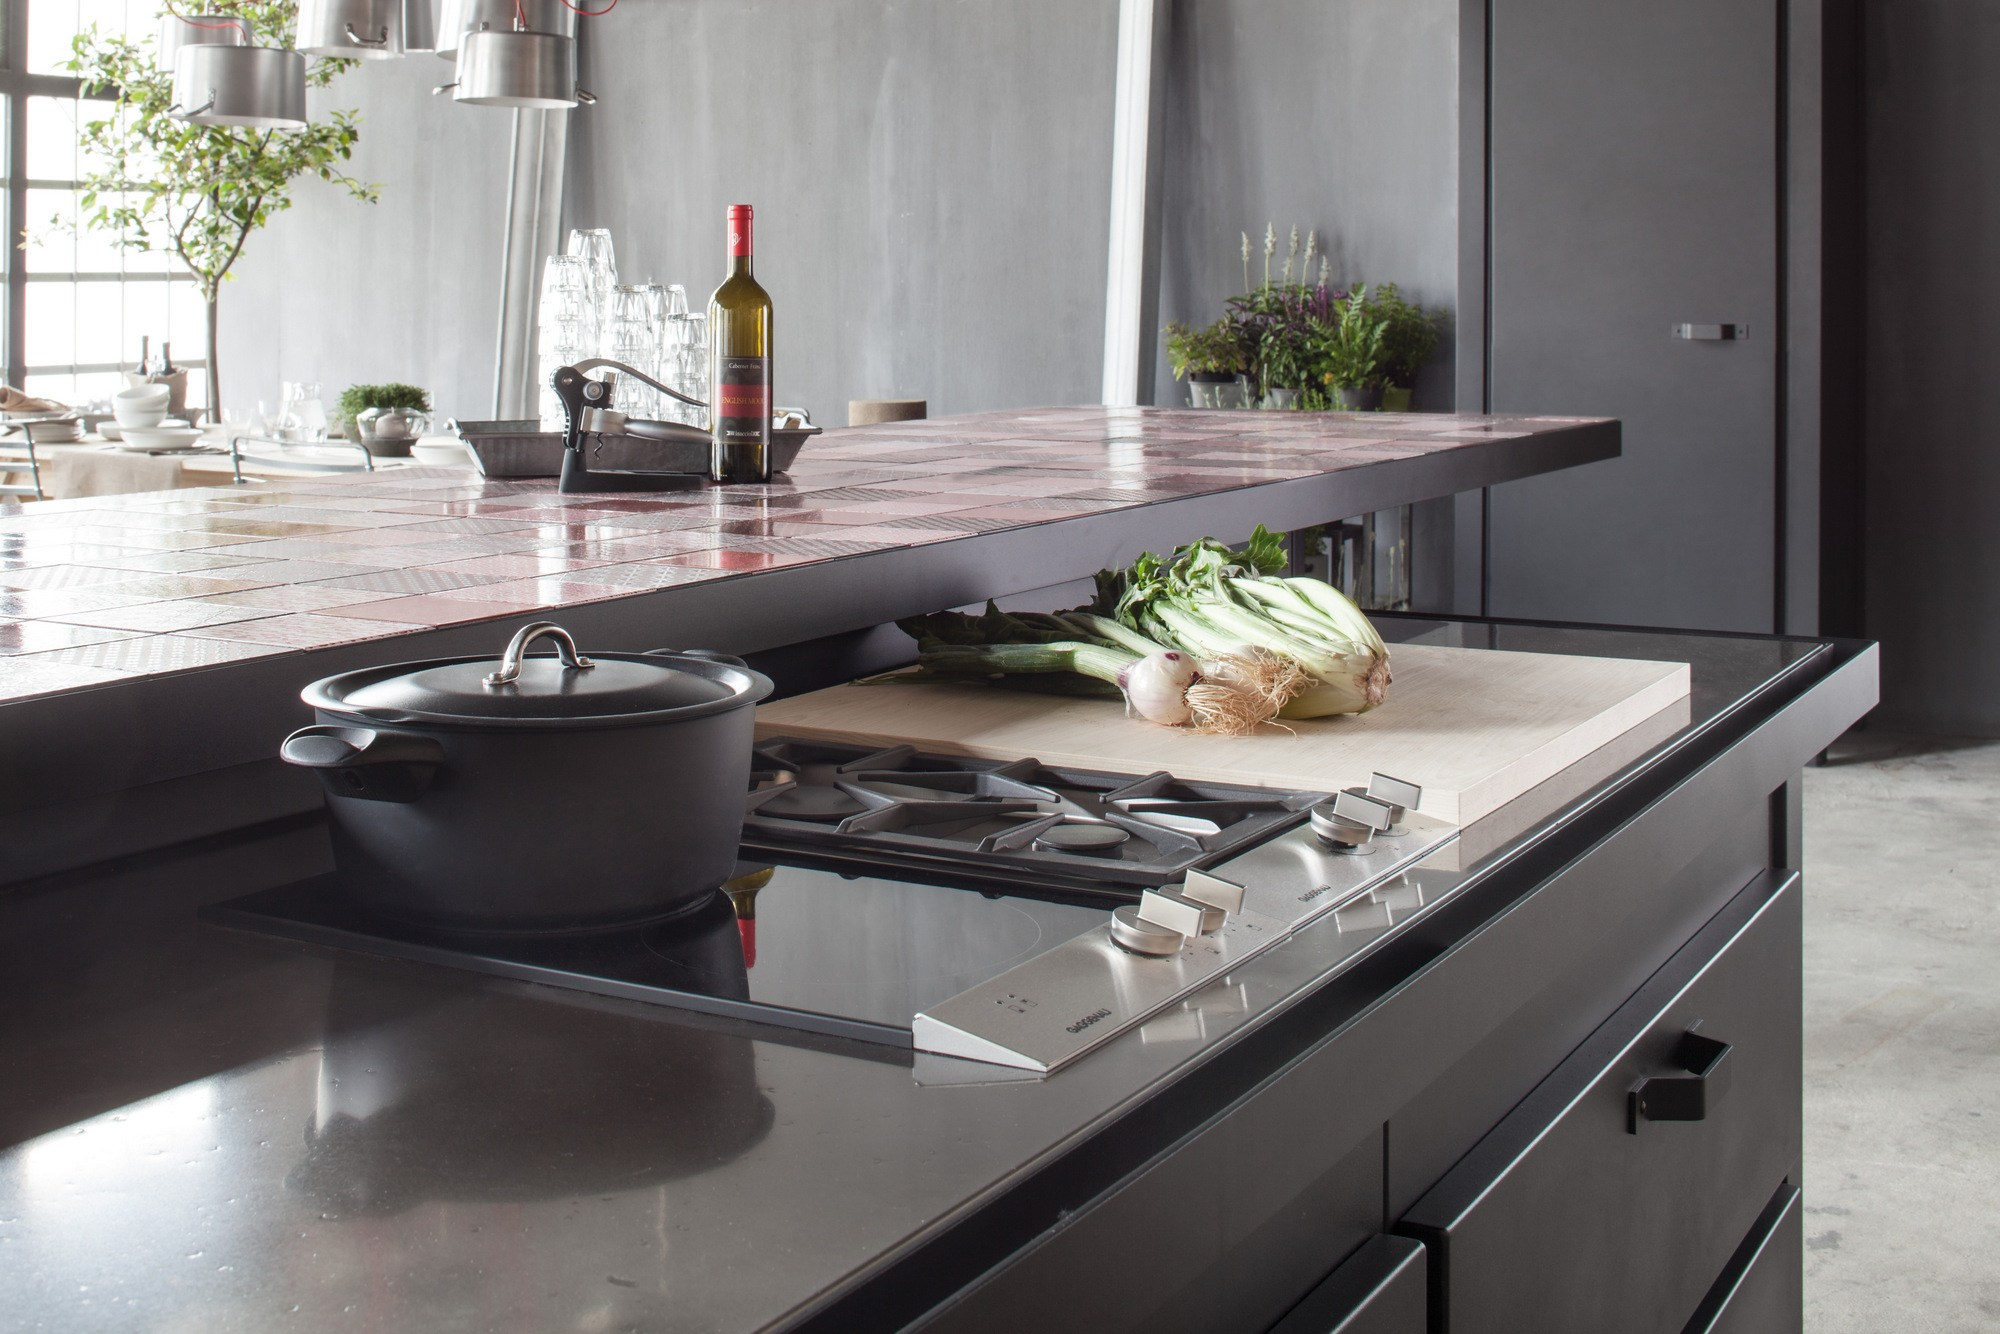 Min cucina by minacciolo - Top cucina pietra lavica ...